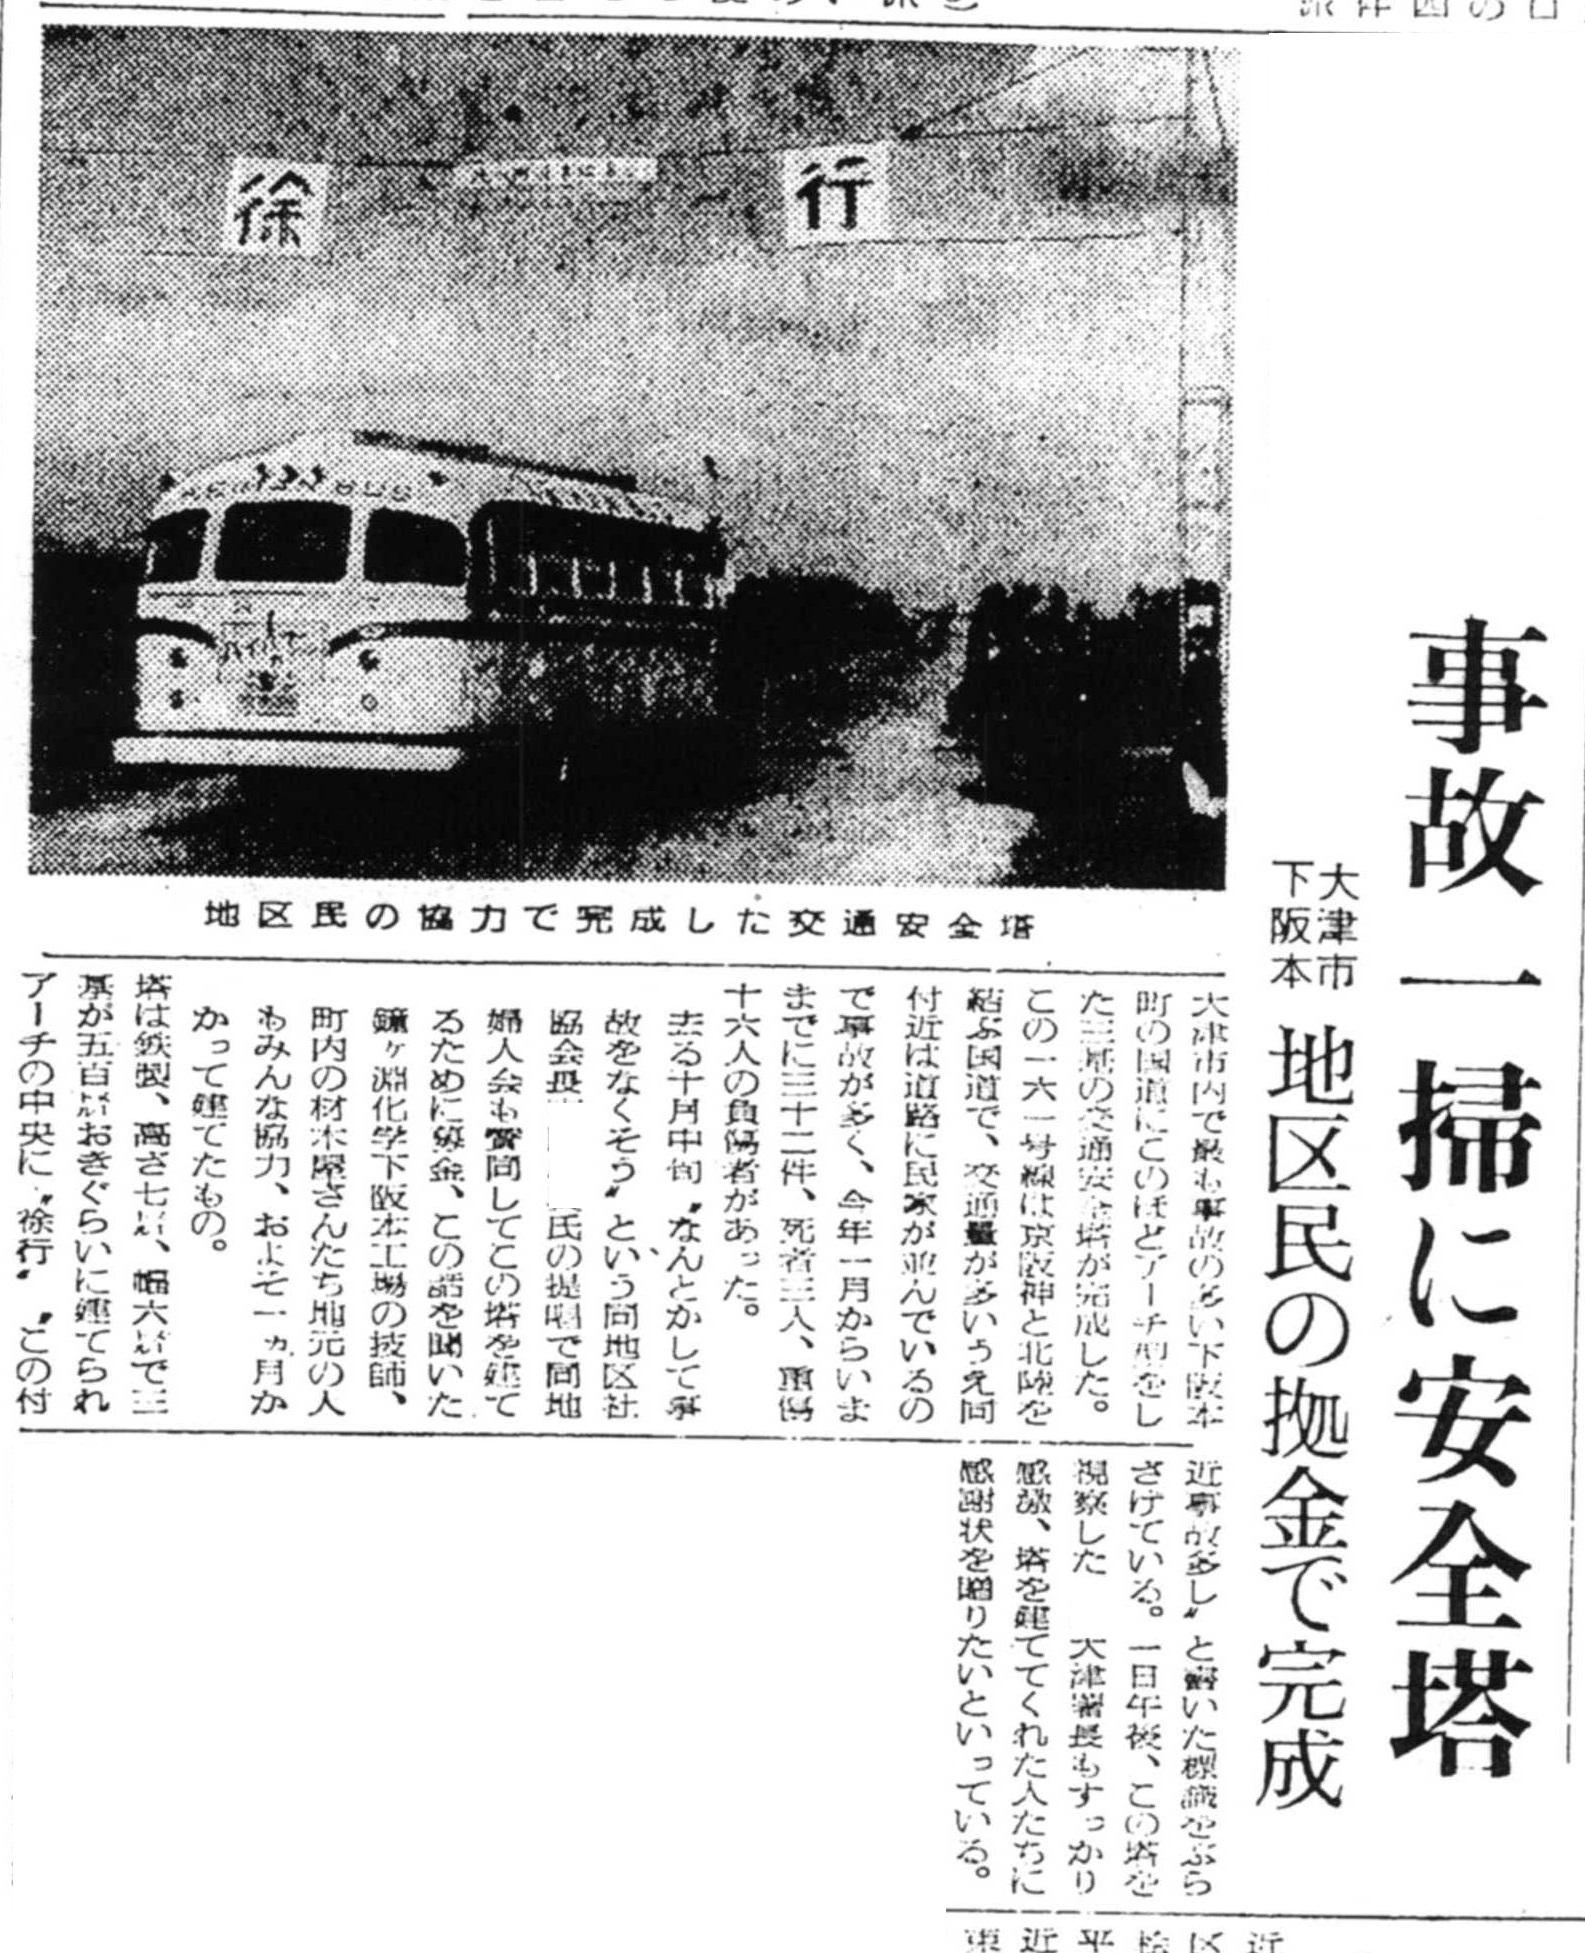 S33.12.2KS 下阪本に交通安全塔b